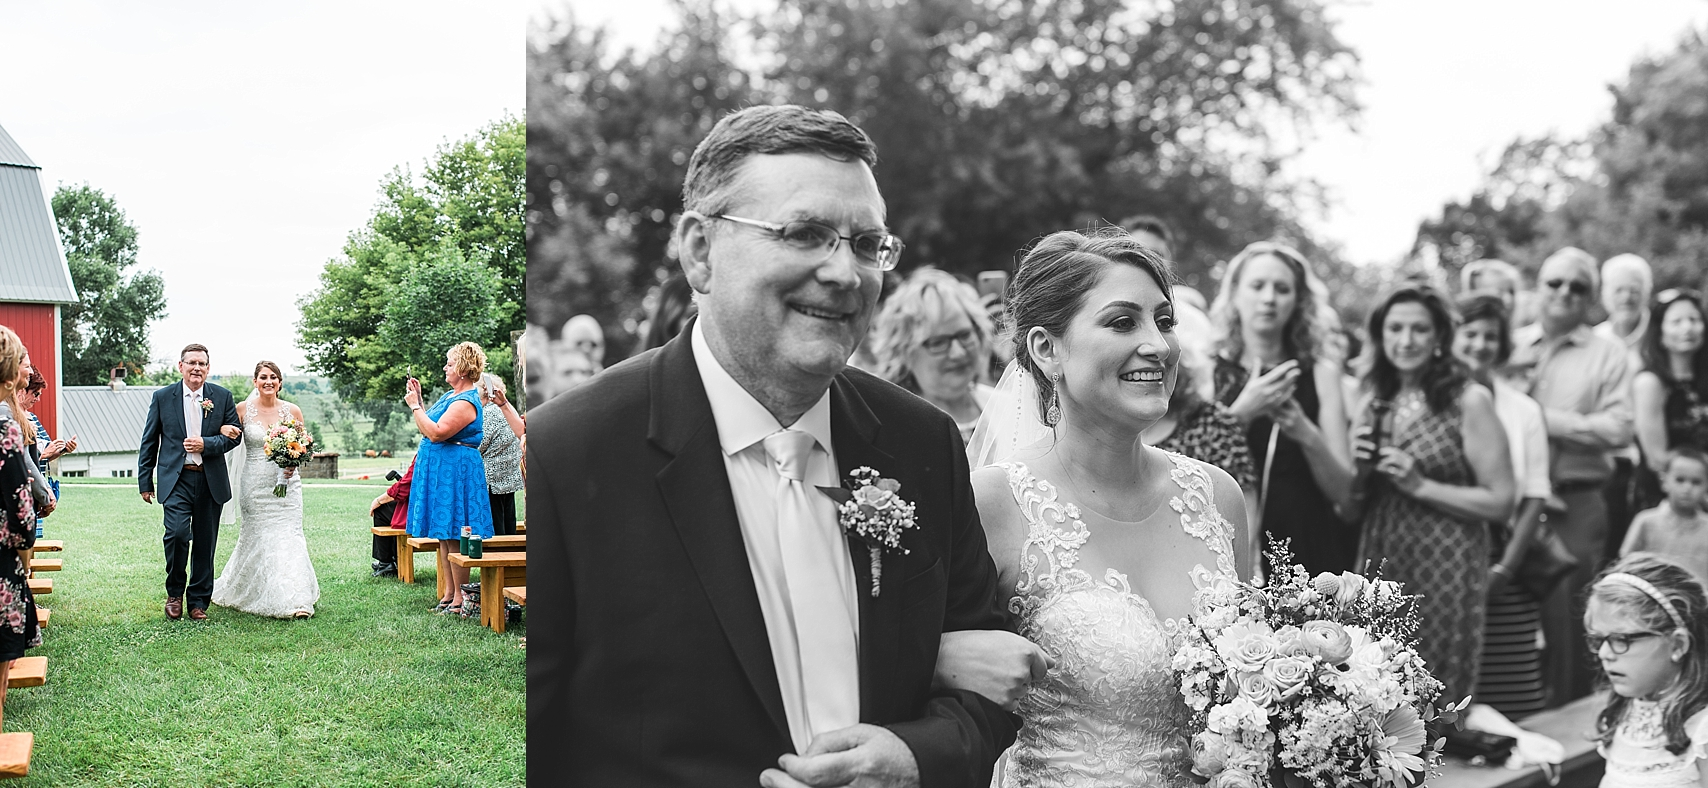 Minnesota Minneapolis Wedding Photographer Best Of 2018 Weddings Mallory Kiesow Photography_0016.jpg